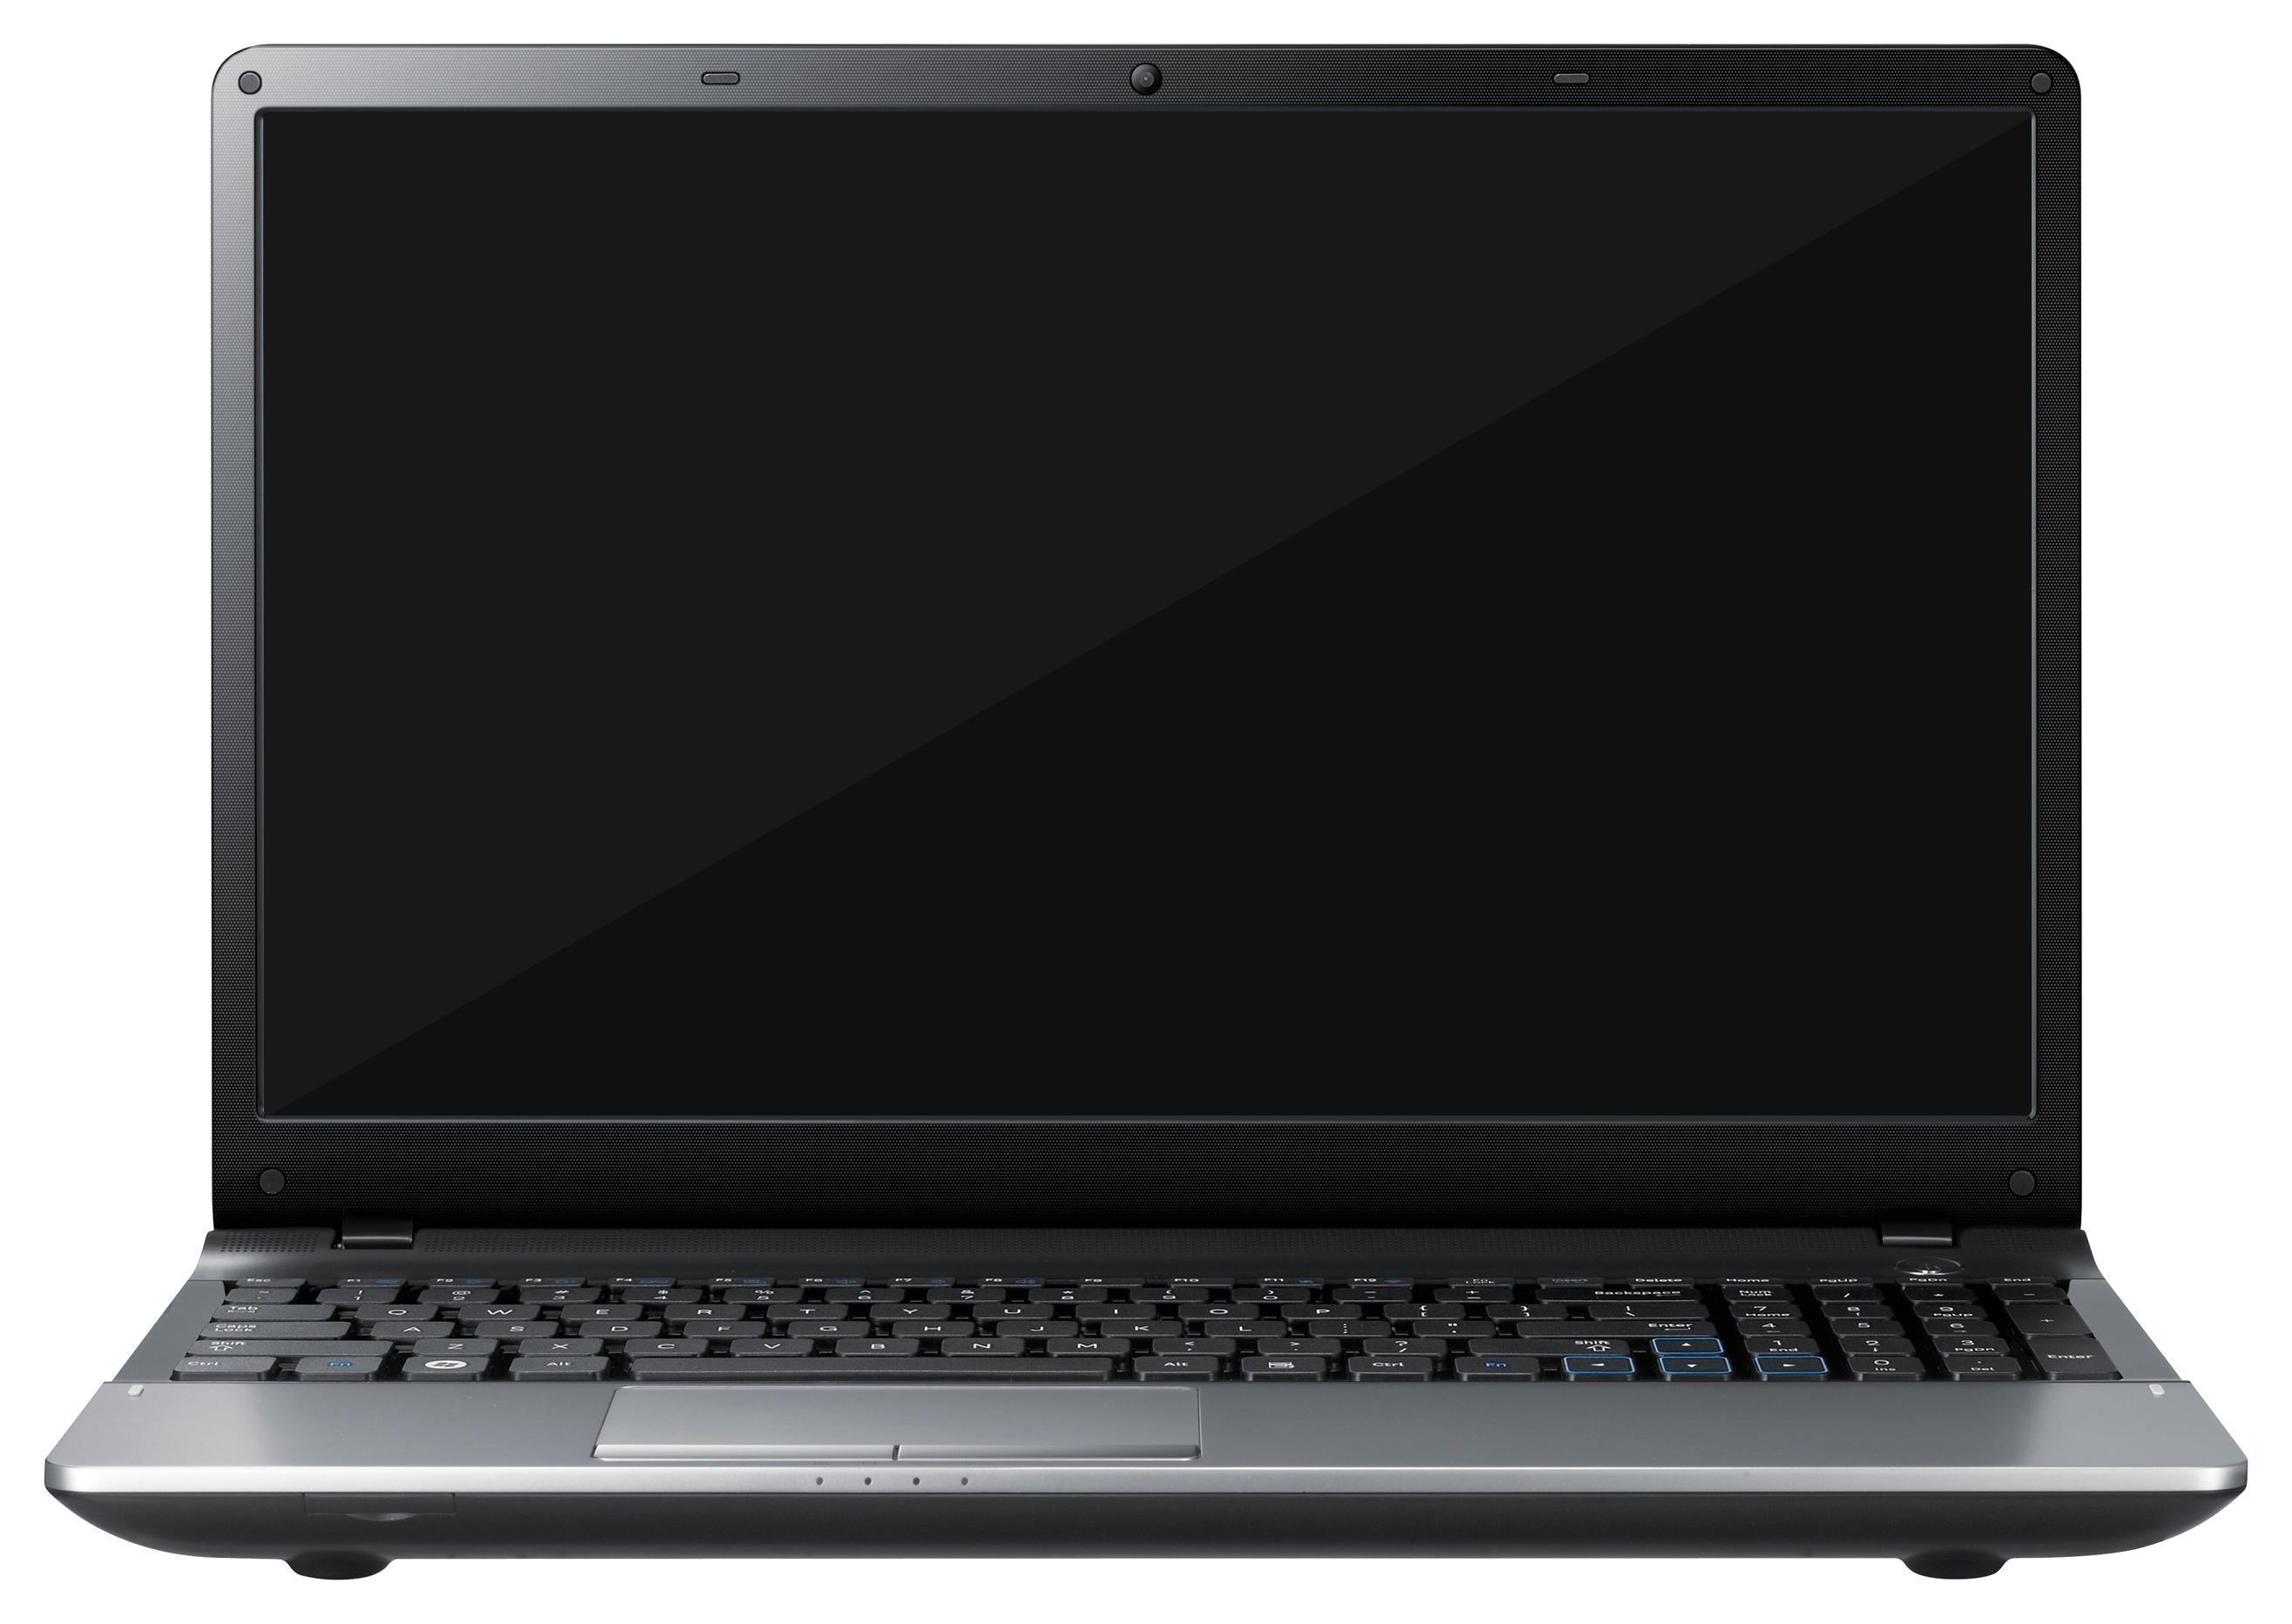 Laptop Notebook Png Image Notebook Laptop Laptop Notebook